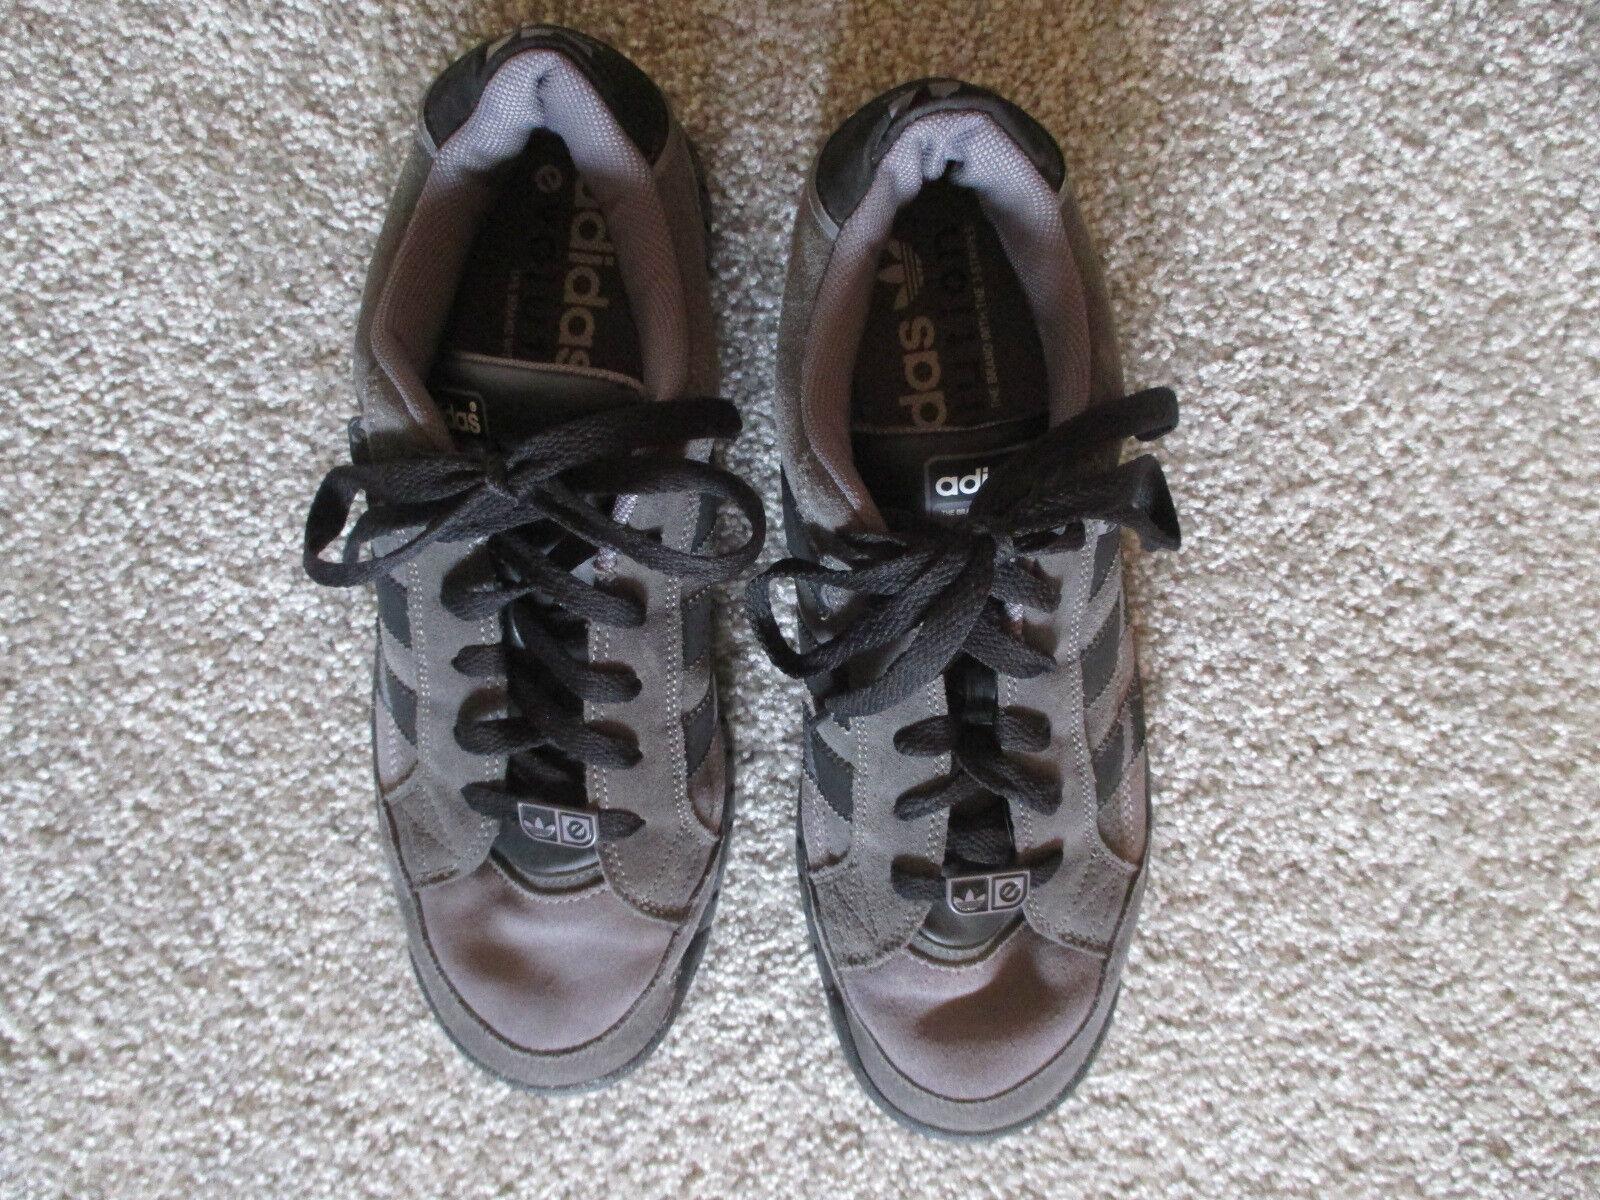 Herren Halbschuhe grau/schwarz Gr. 10 1/2  Adidas